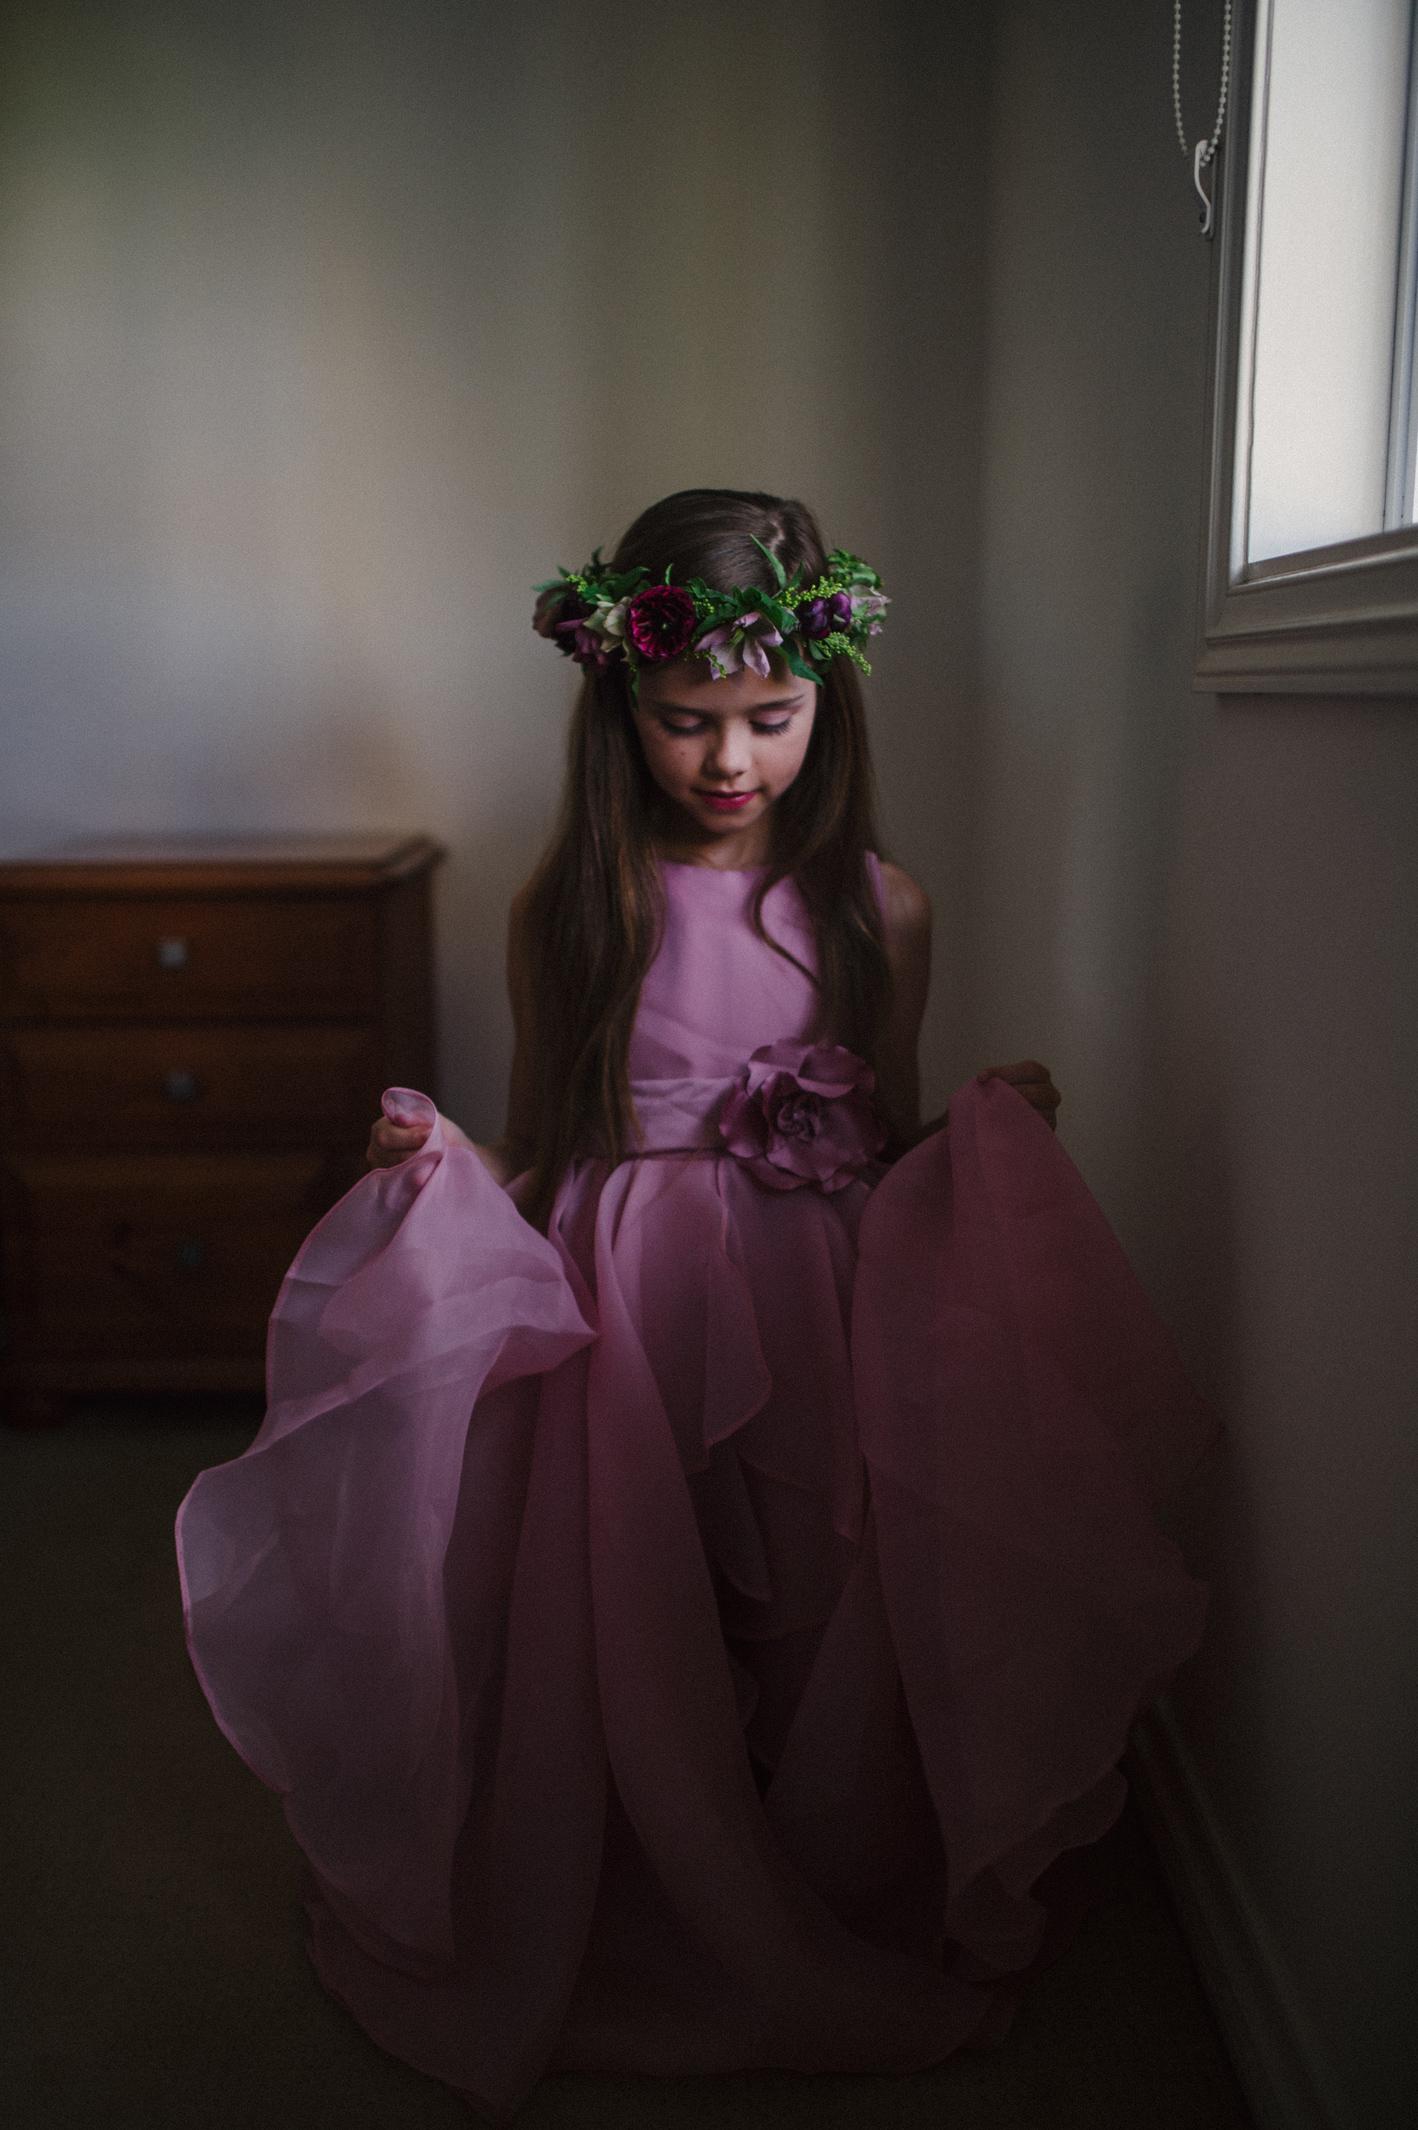 019-crown-of-eden-sophie-baker-photography